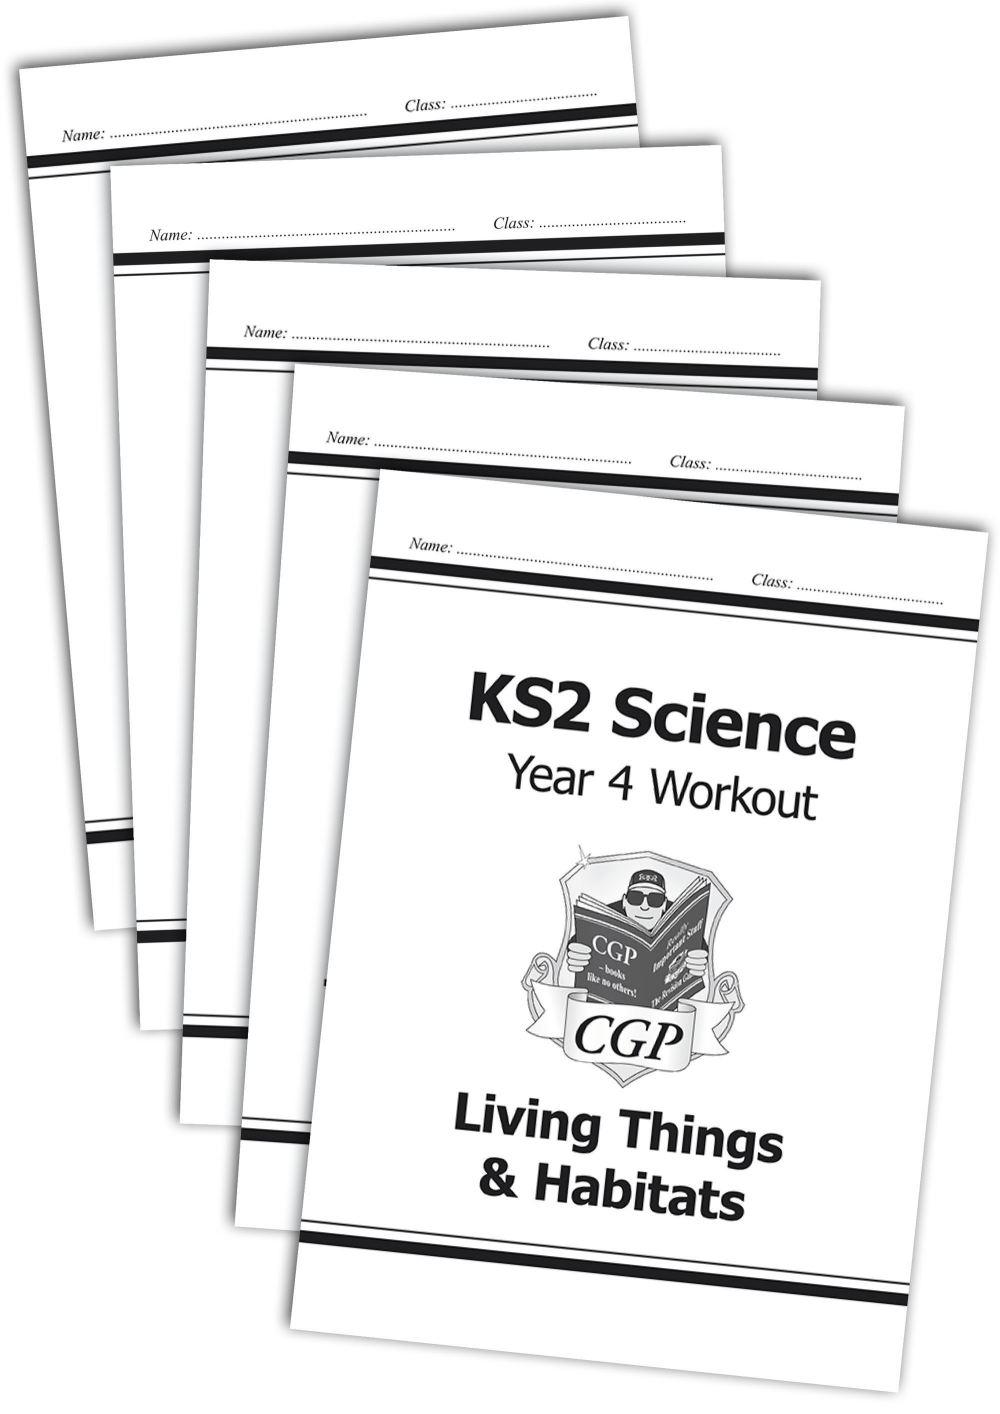 medium resolution of KS2 Science Year 6 Workout Bundle   CGP Books